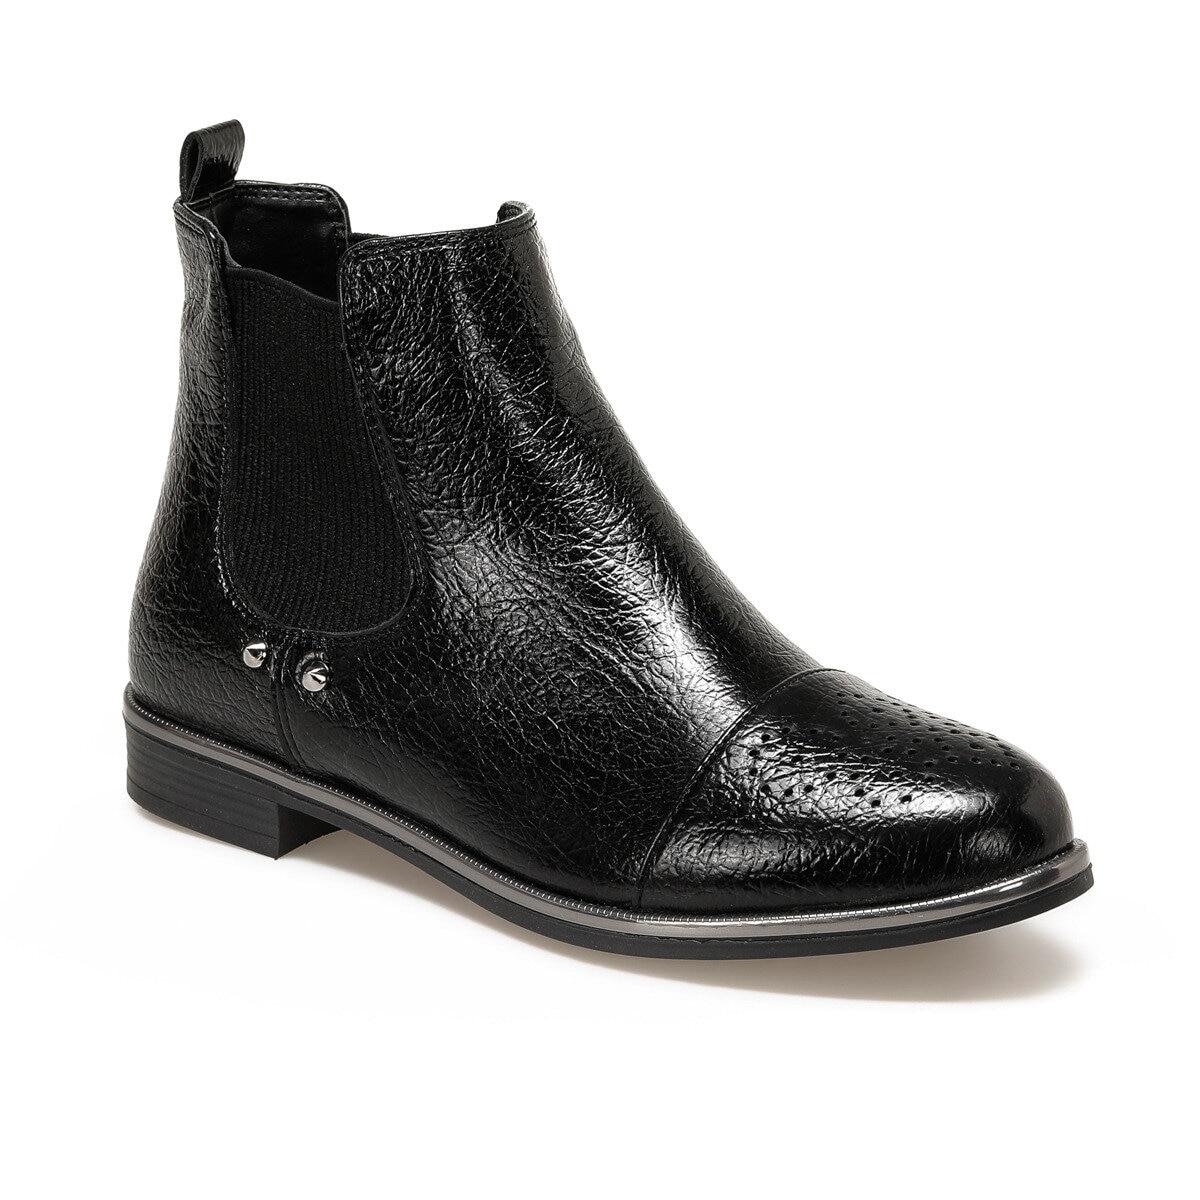 FLO 19K-031 Black Women Boots BUTIGO